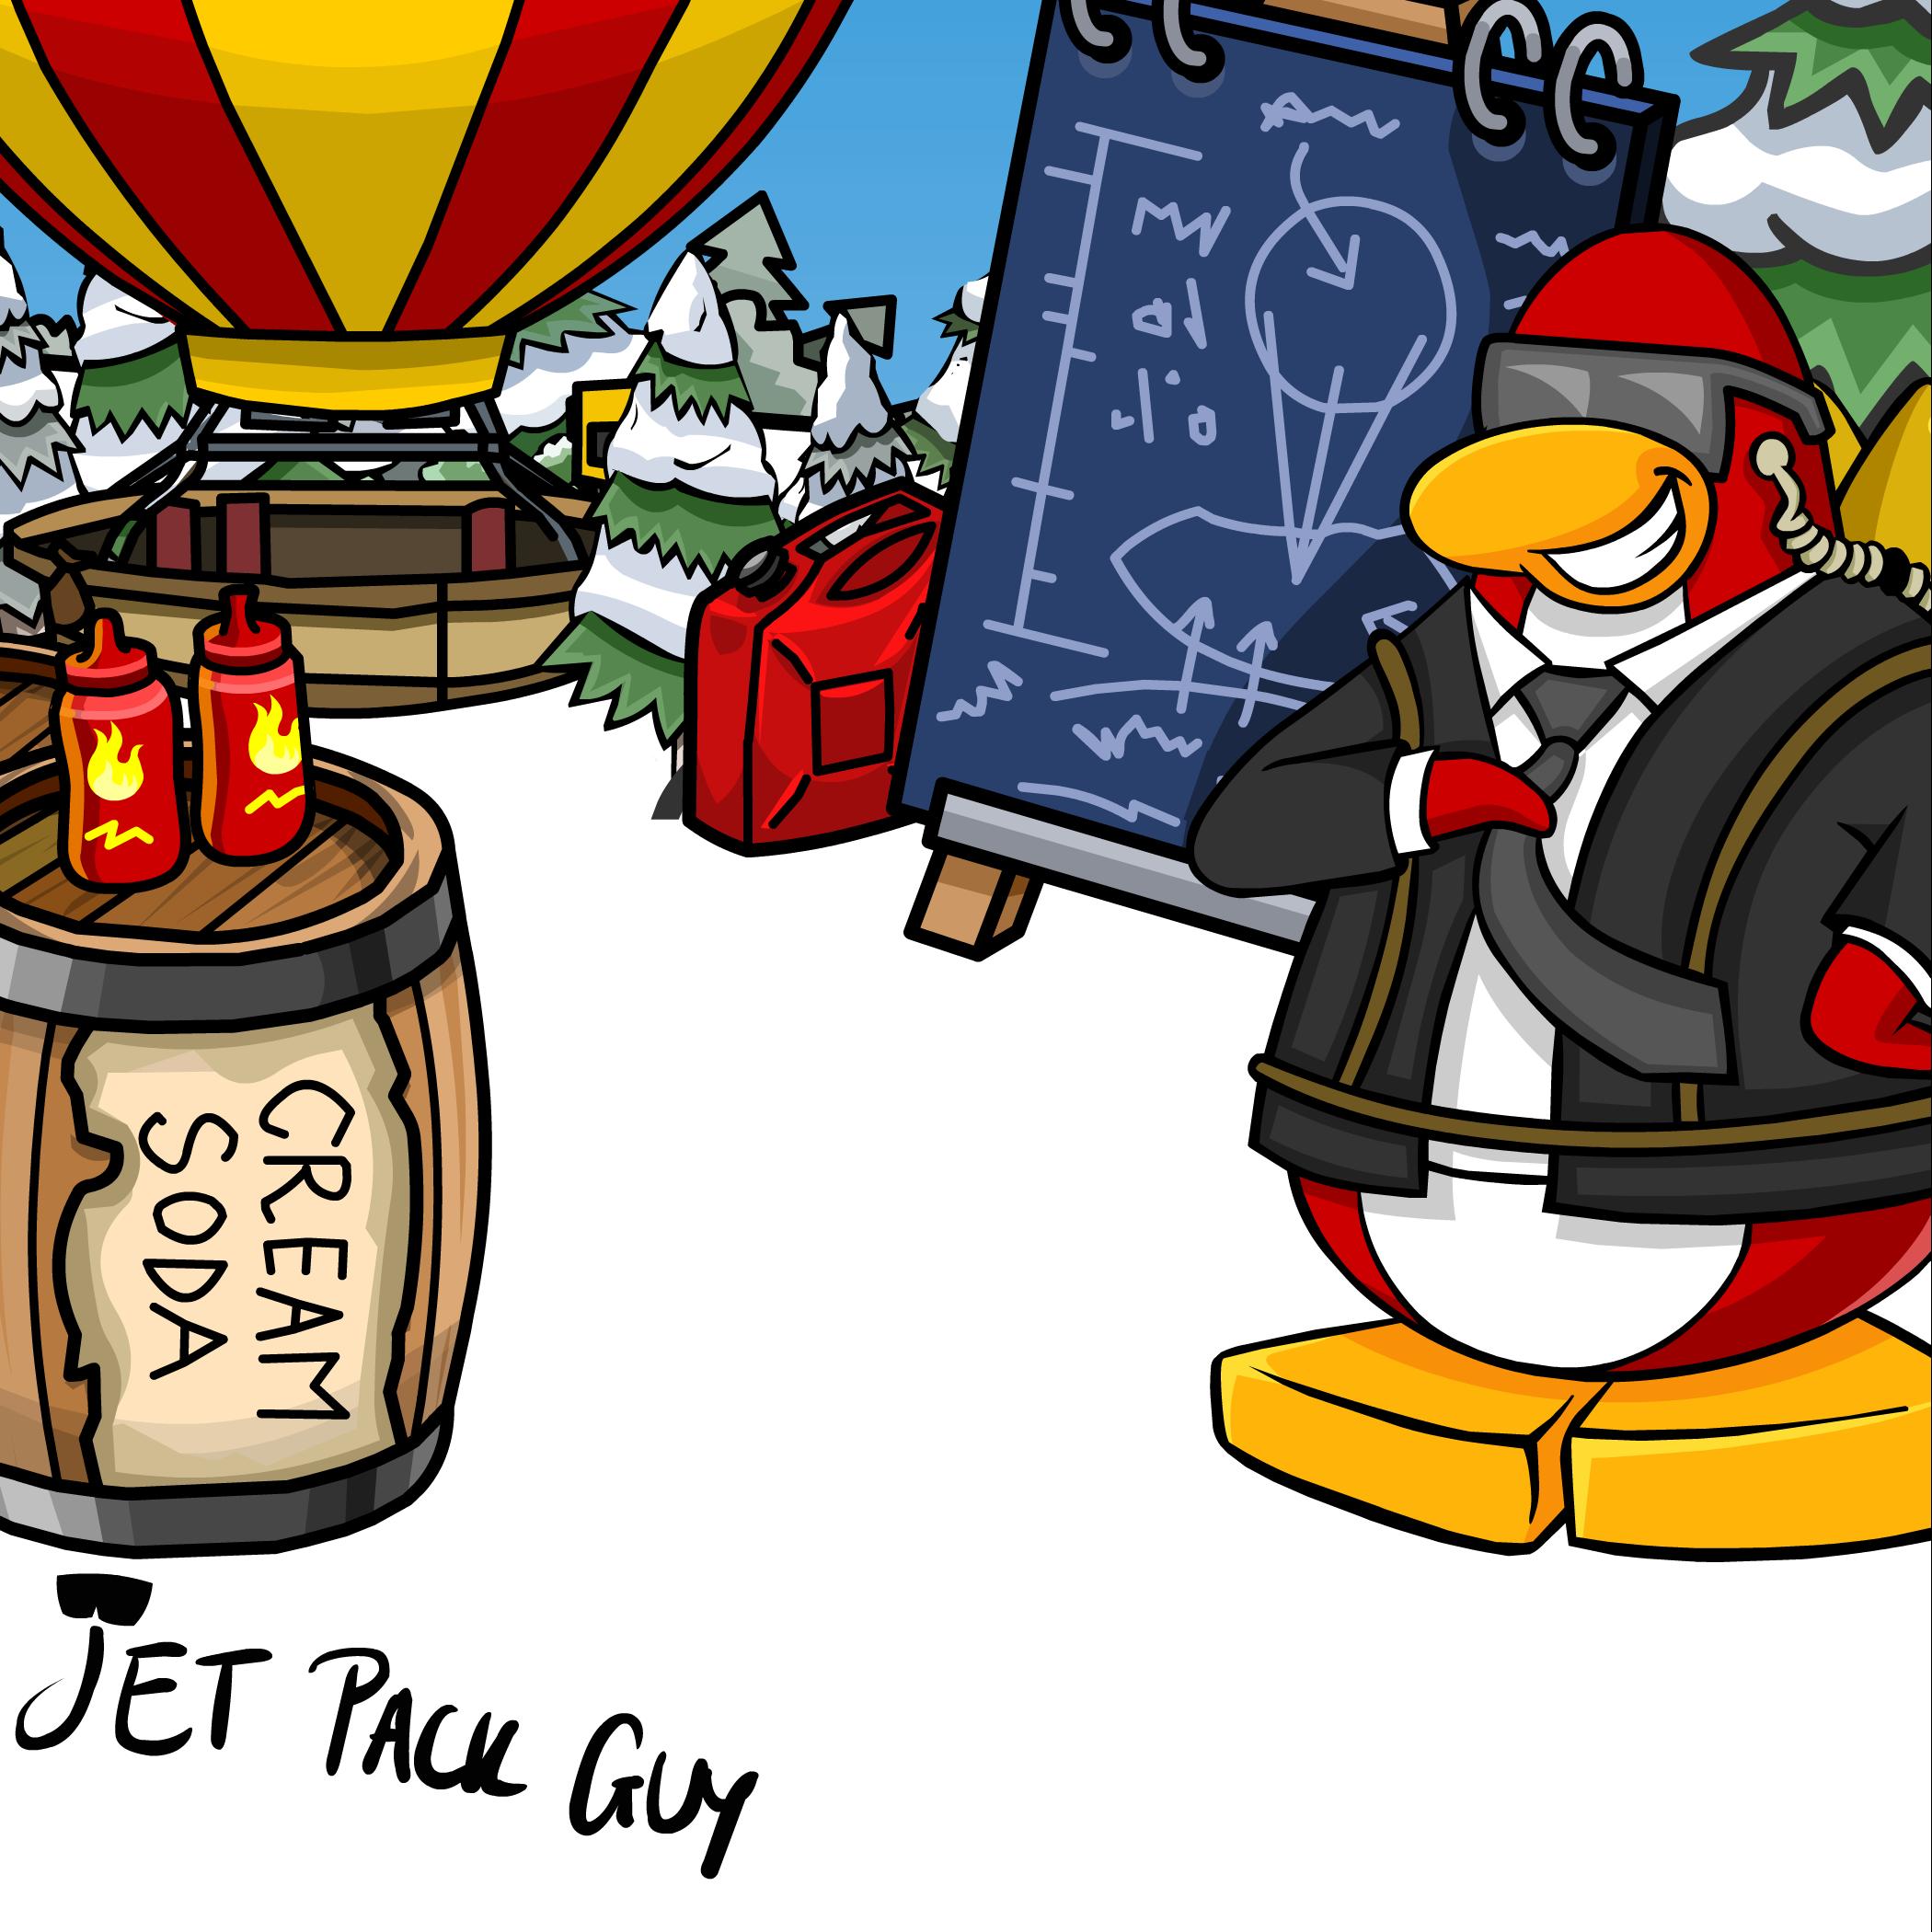 Jet Pack Guy Background